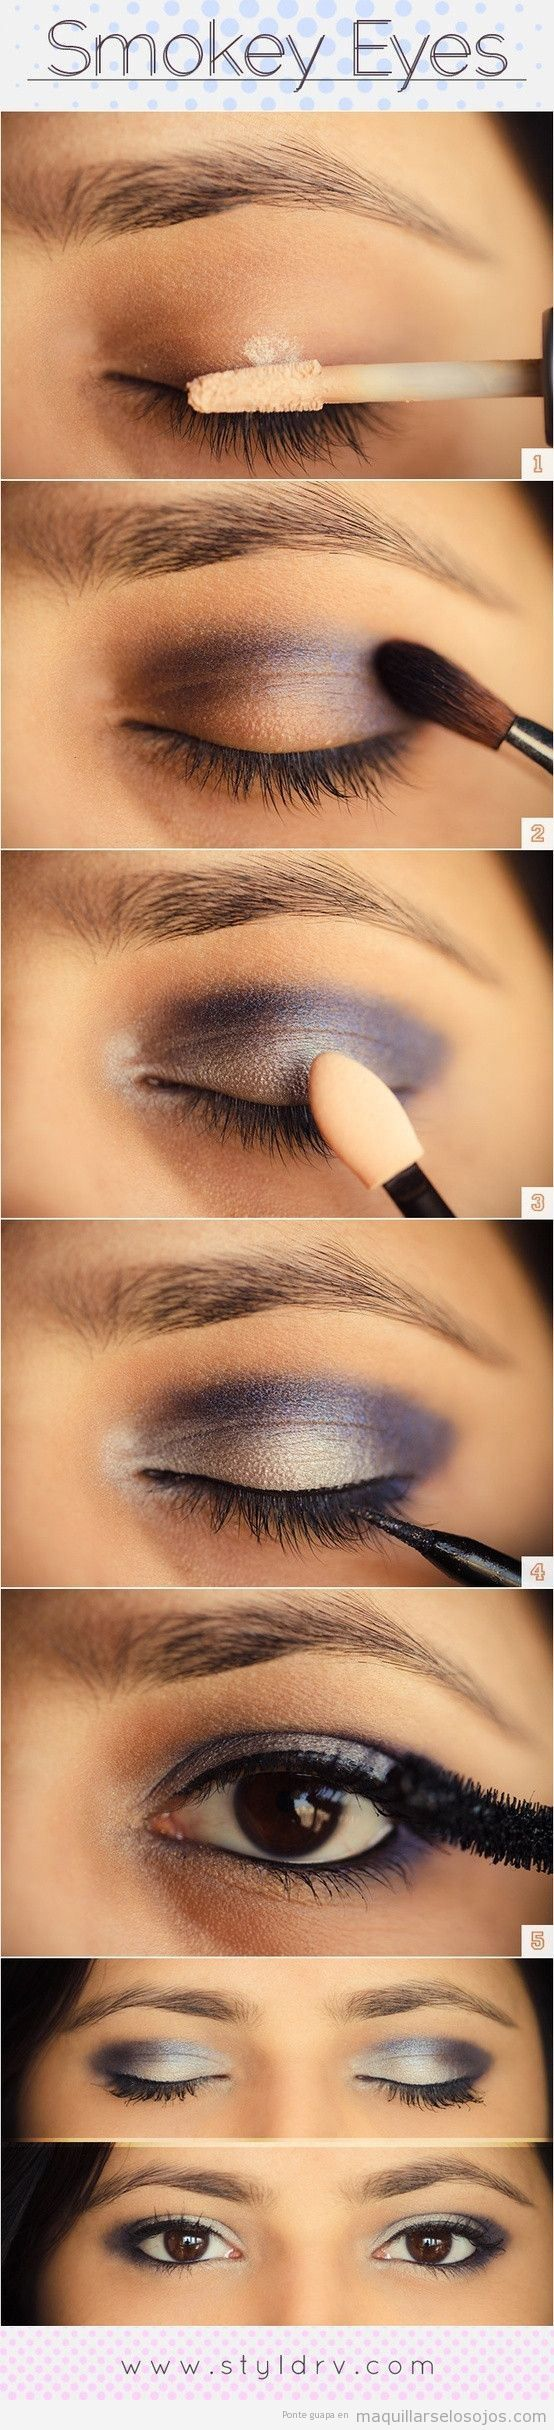 Tutorial maquillaje para agrandar ojos pequeños